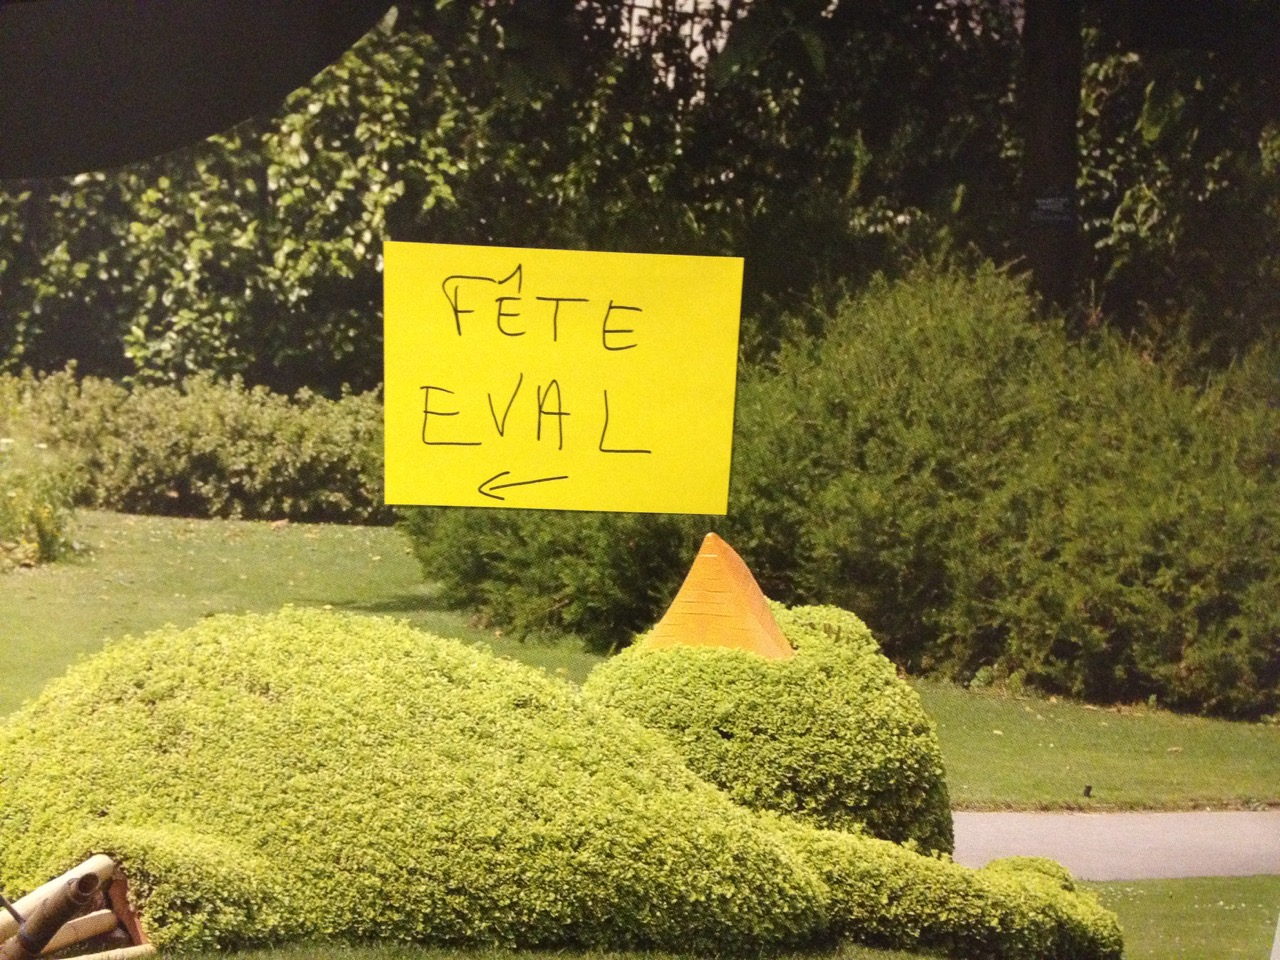 fete-eval-nantes-3